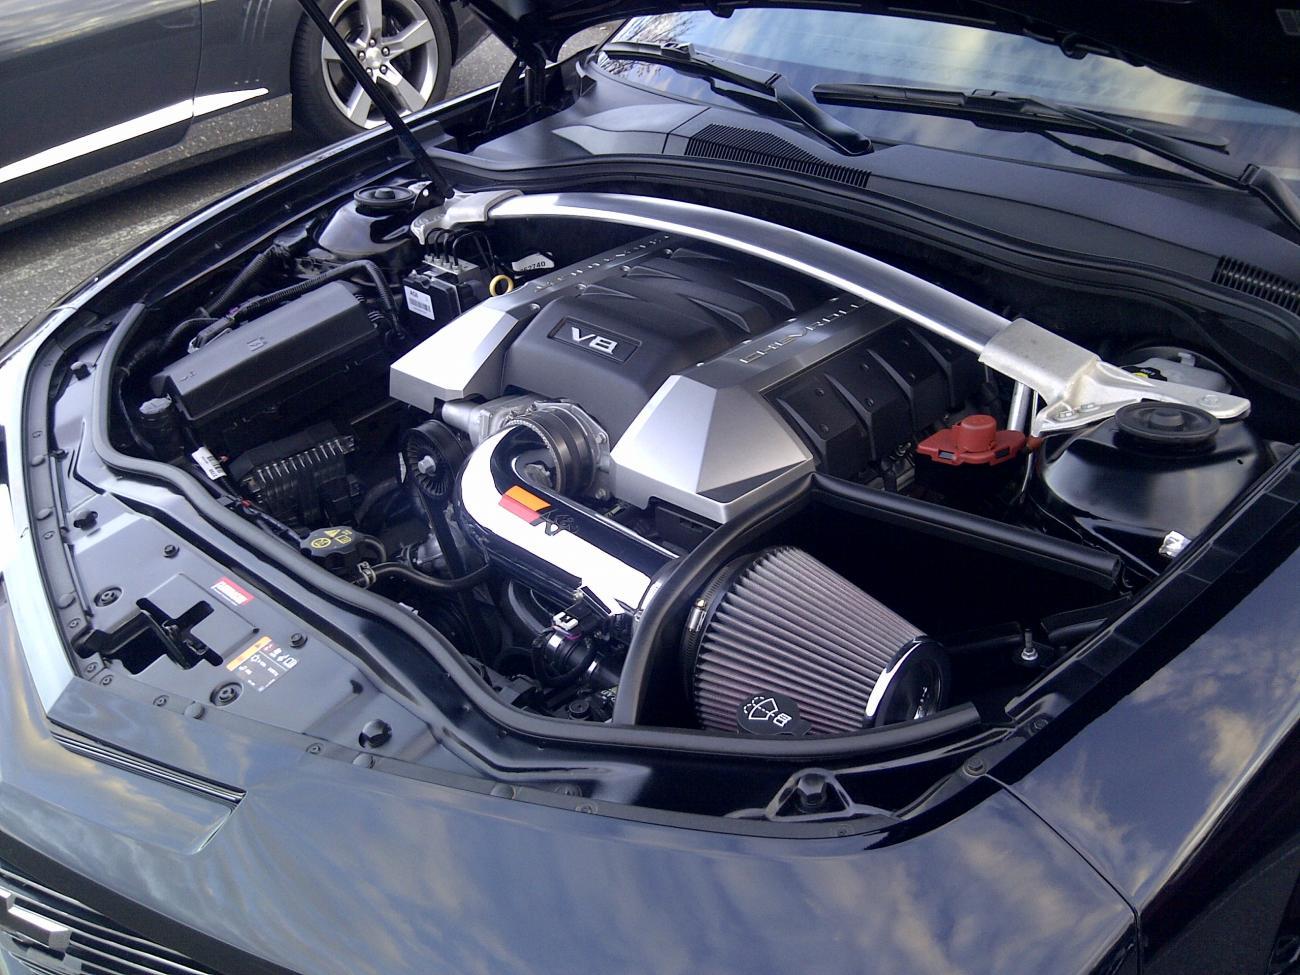 My Engine bay - Camaro5 Chevy Camaro Forum / Camaro ZL1, SS and V6 ...